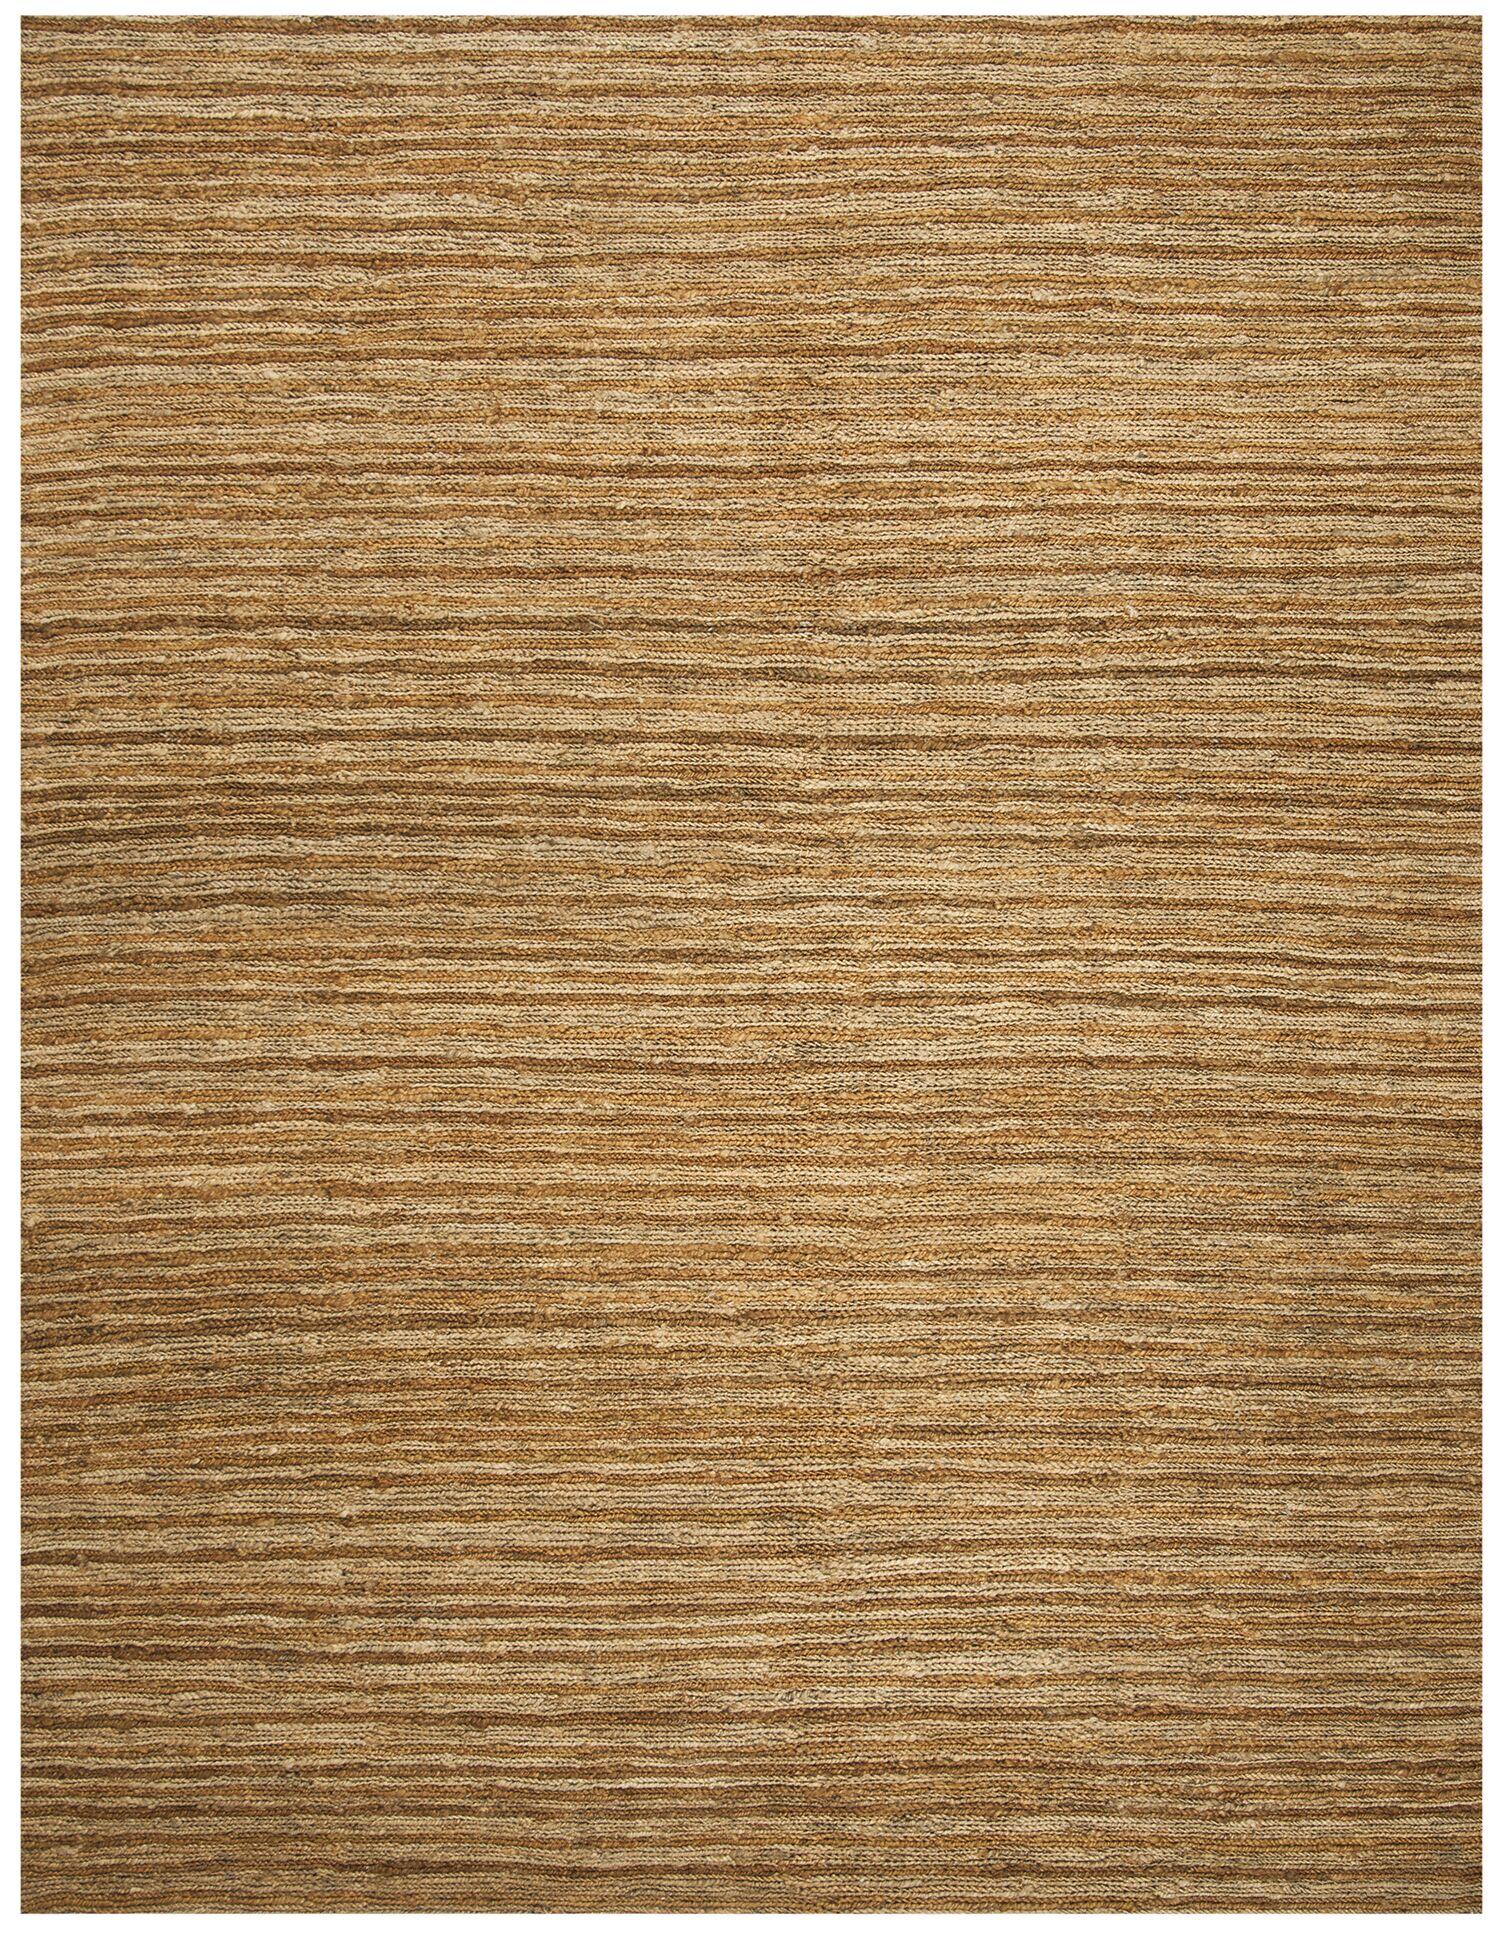 Feliciana Natural Area Rug Rug Size: Rectangle 8' x 10'